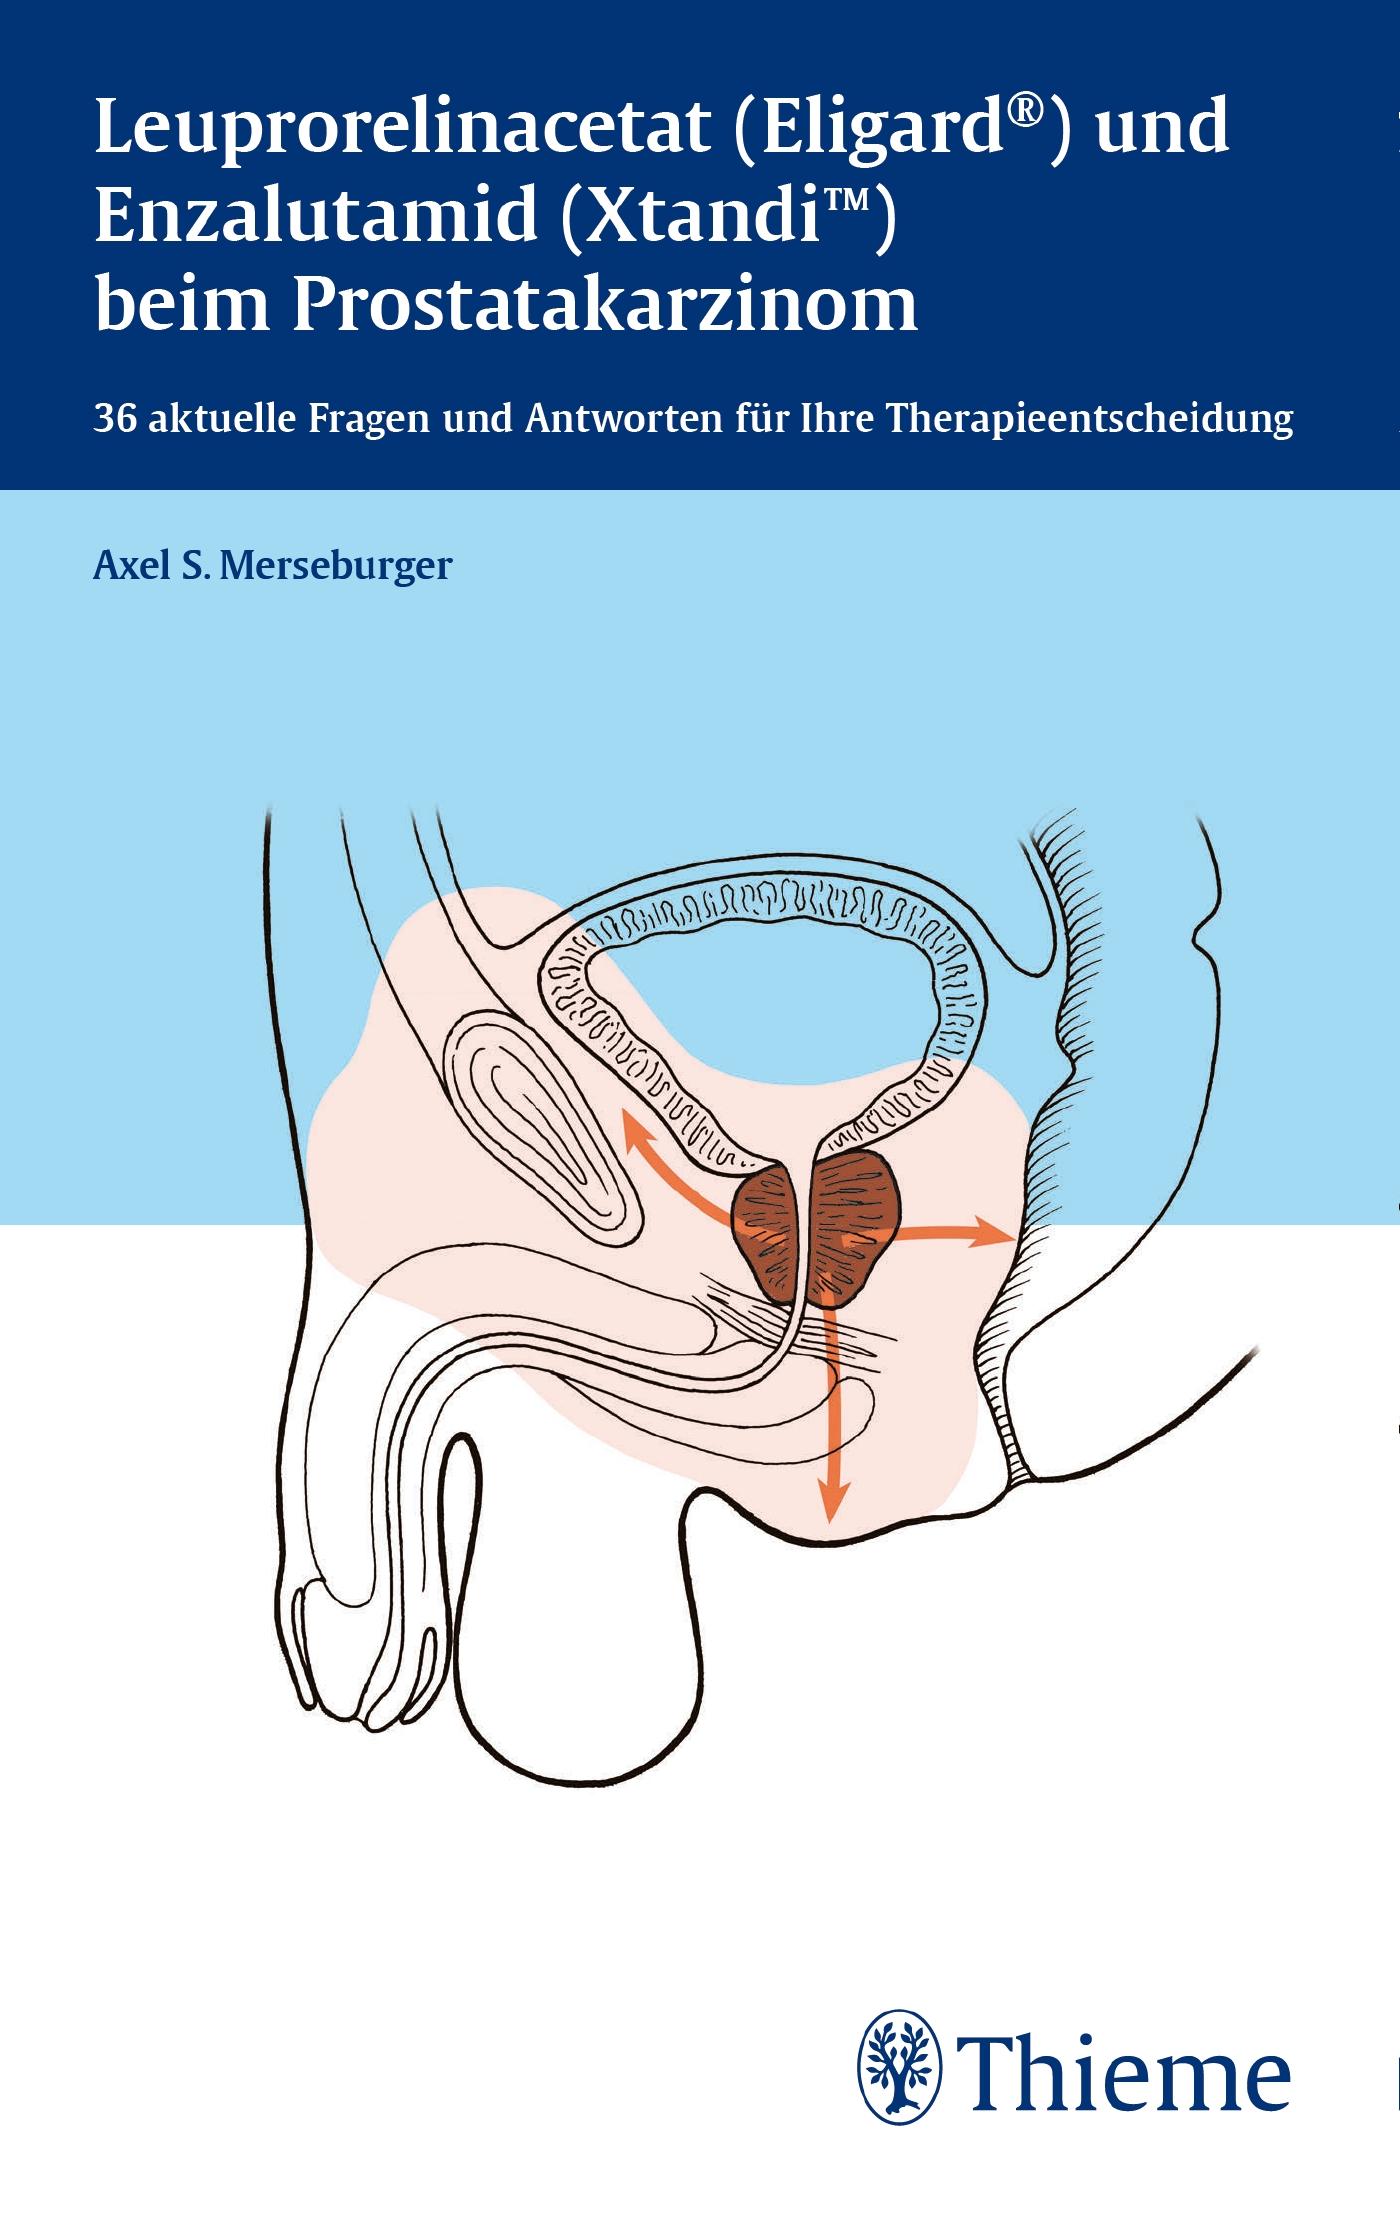 Leuprorelinacetat (Eligard®) und Enzalutamid (Xtandi) beim Prostatakarzinom